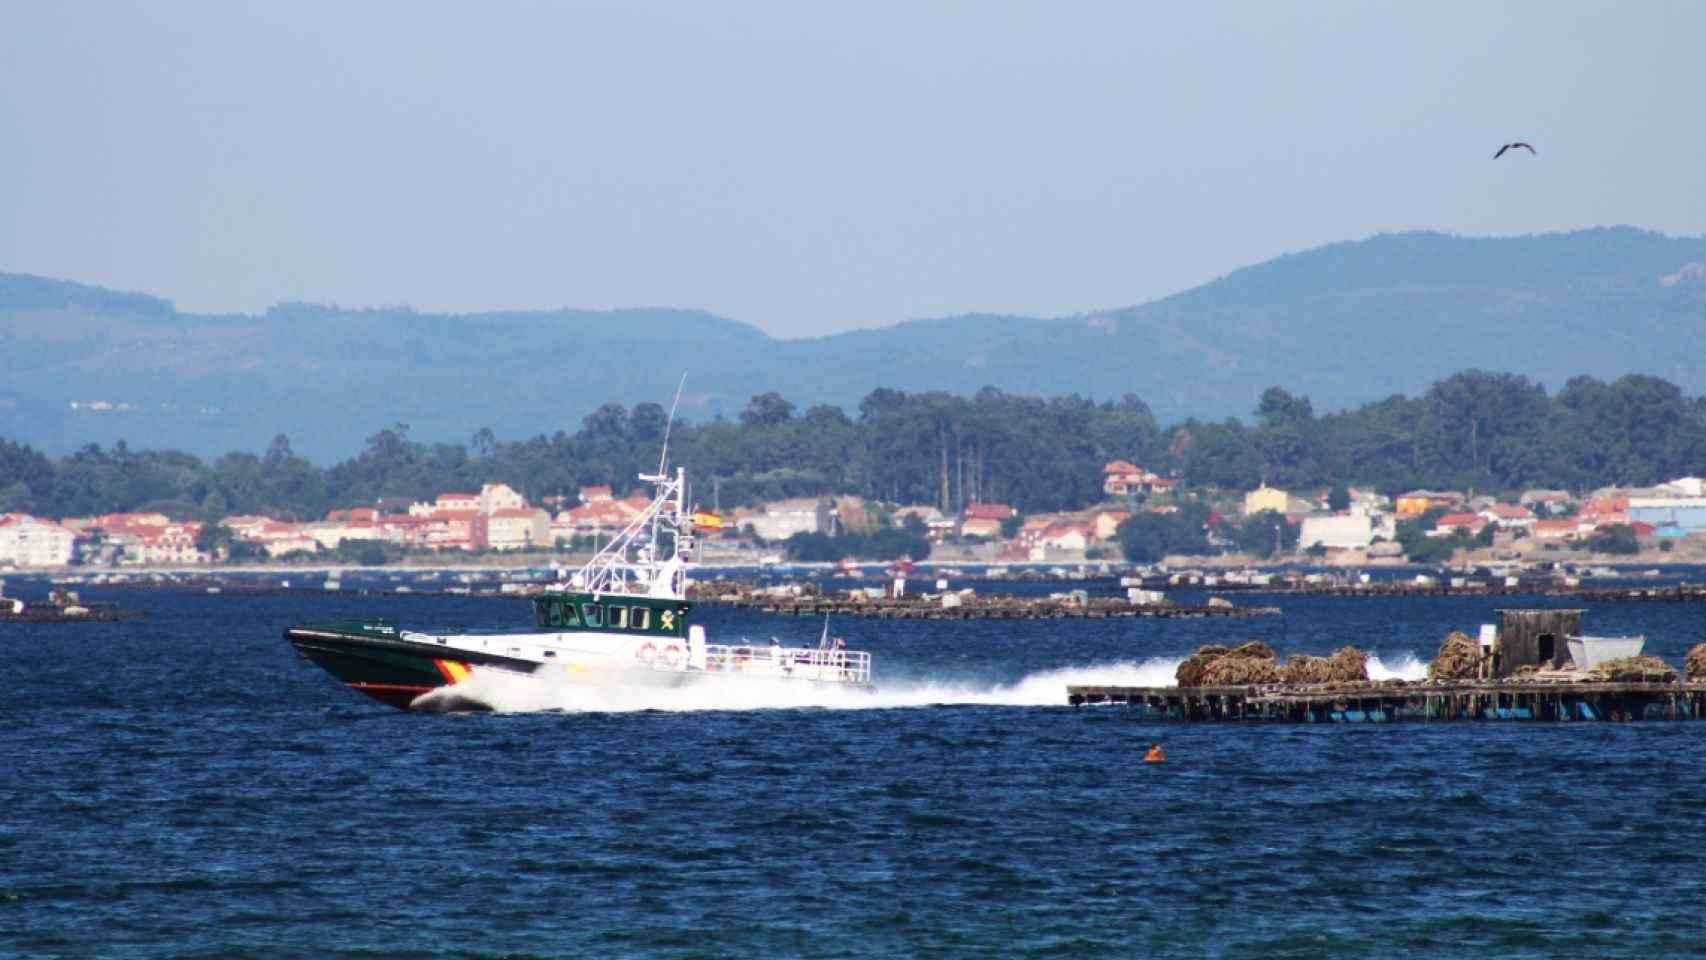 Una patrullera de la Guardia Civil busca indicios en el mar de A Pobra.